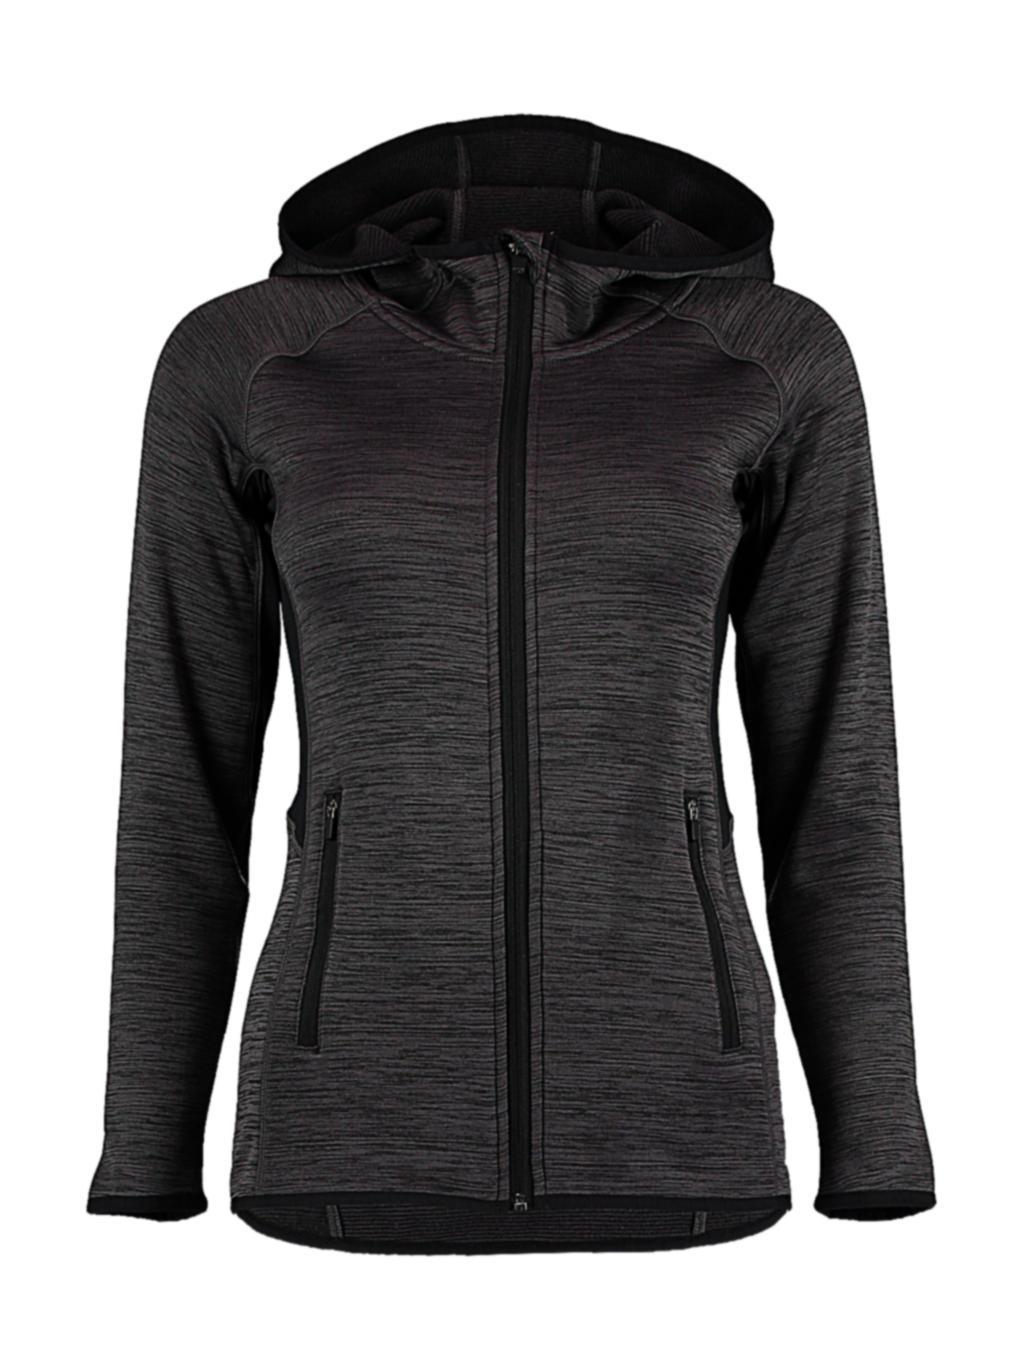 Gamegear® Ladies Sports Jacket